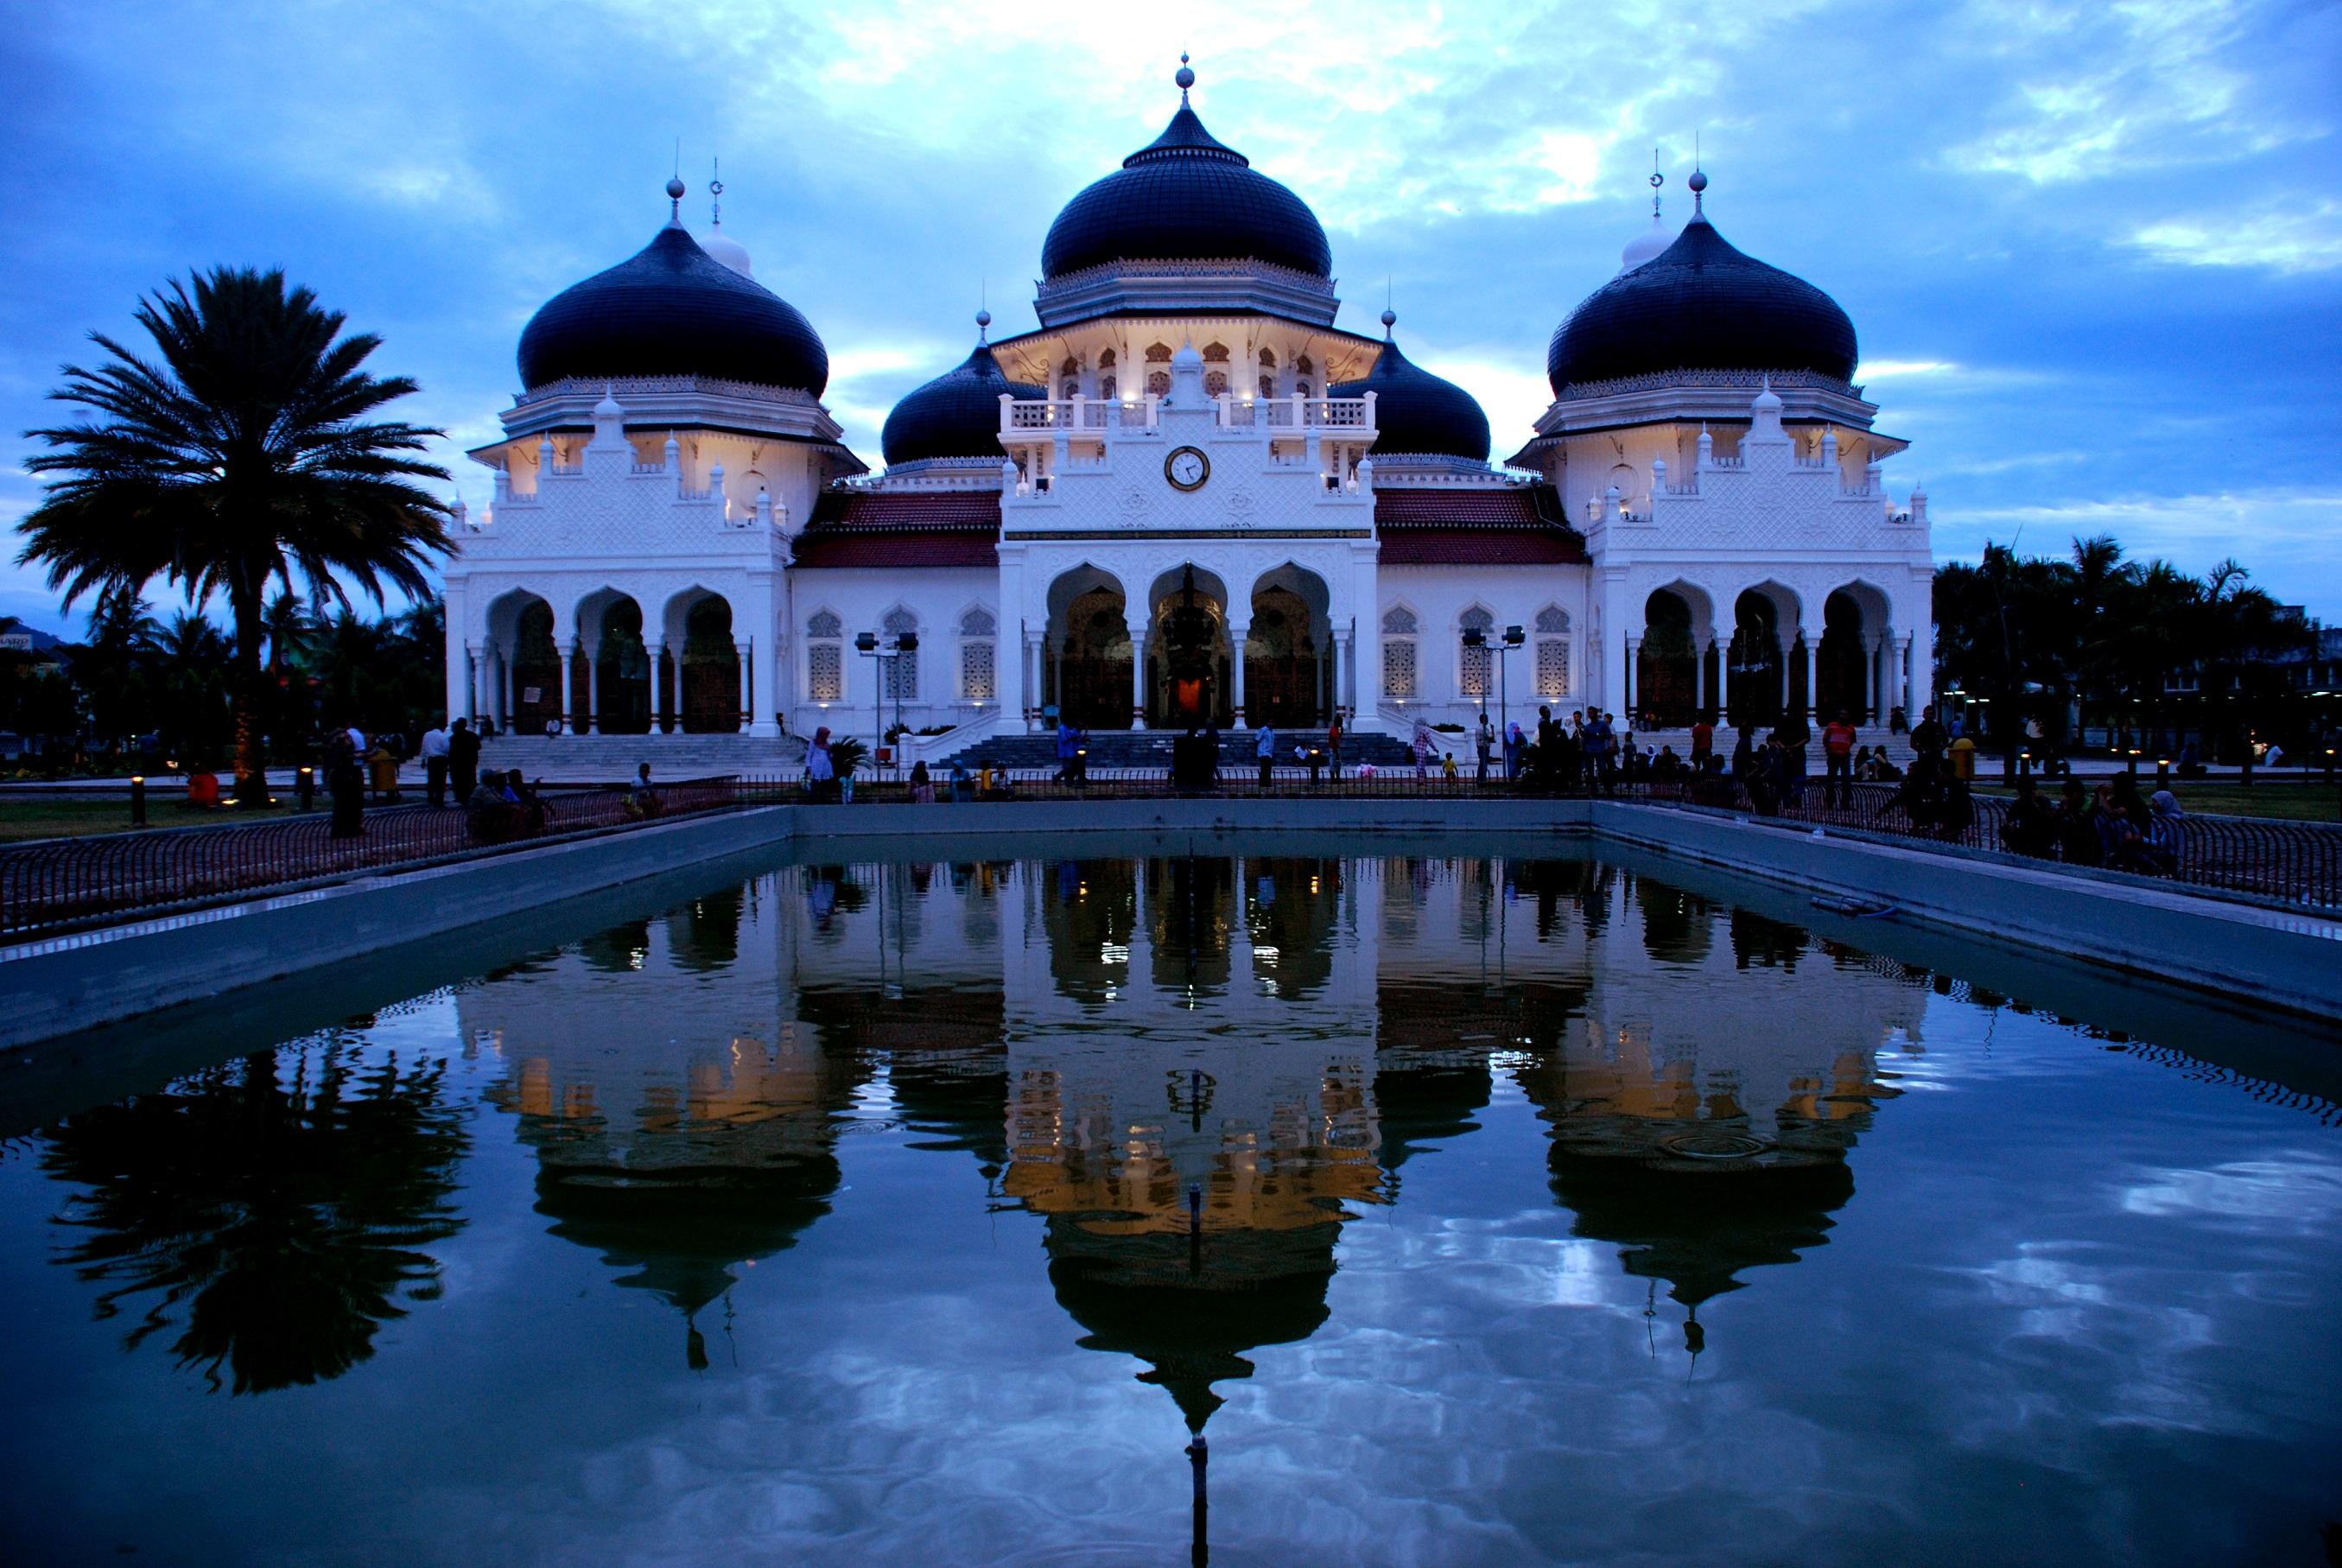 10 Tempat Wisata Aceh Wajib Dikunjungi Masjid Raya Baiturrahman Baiturrahim